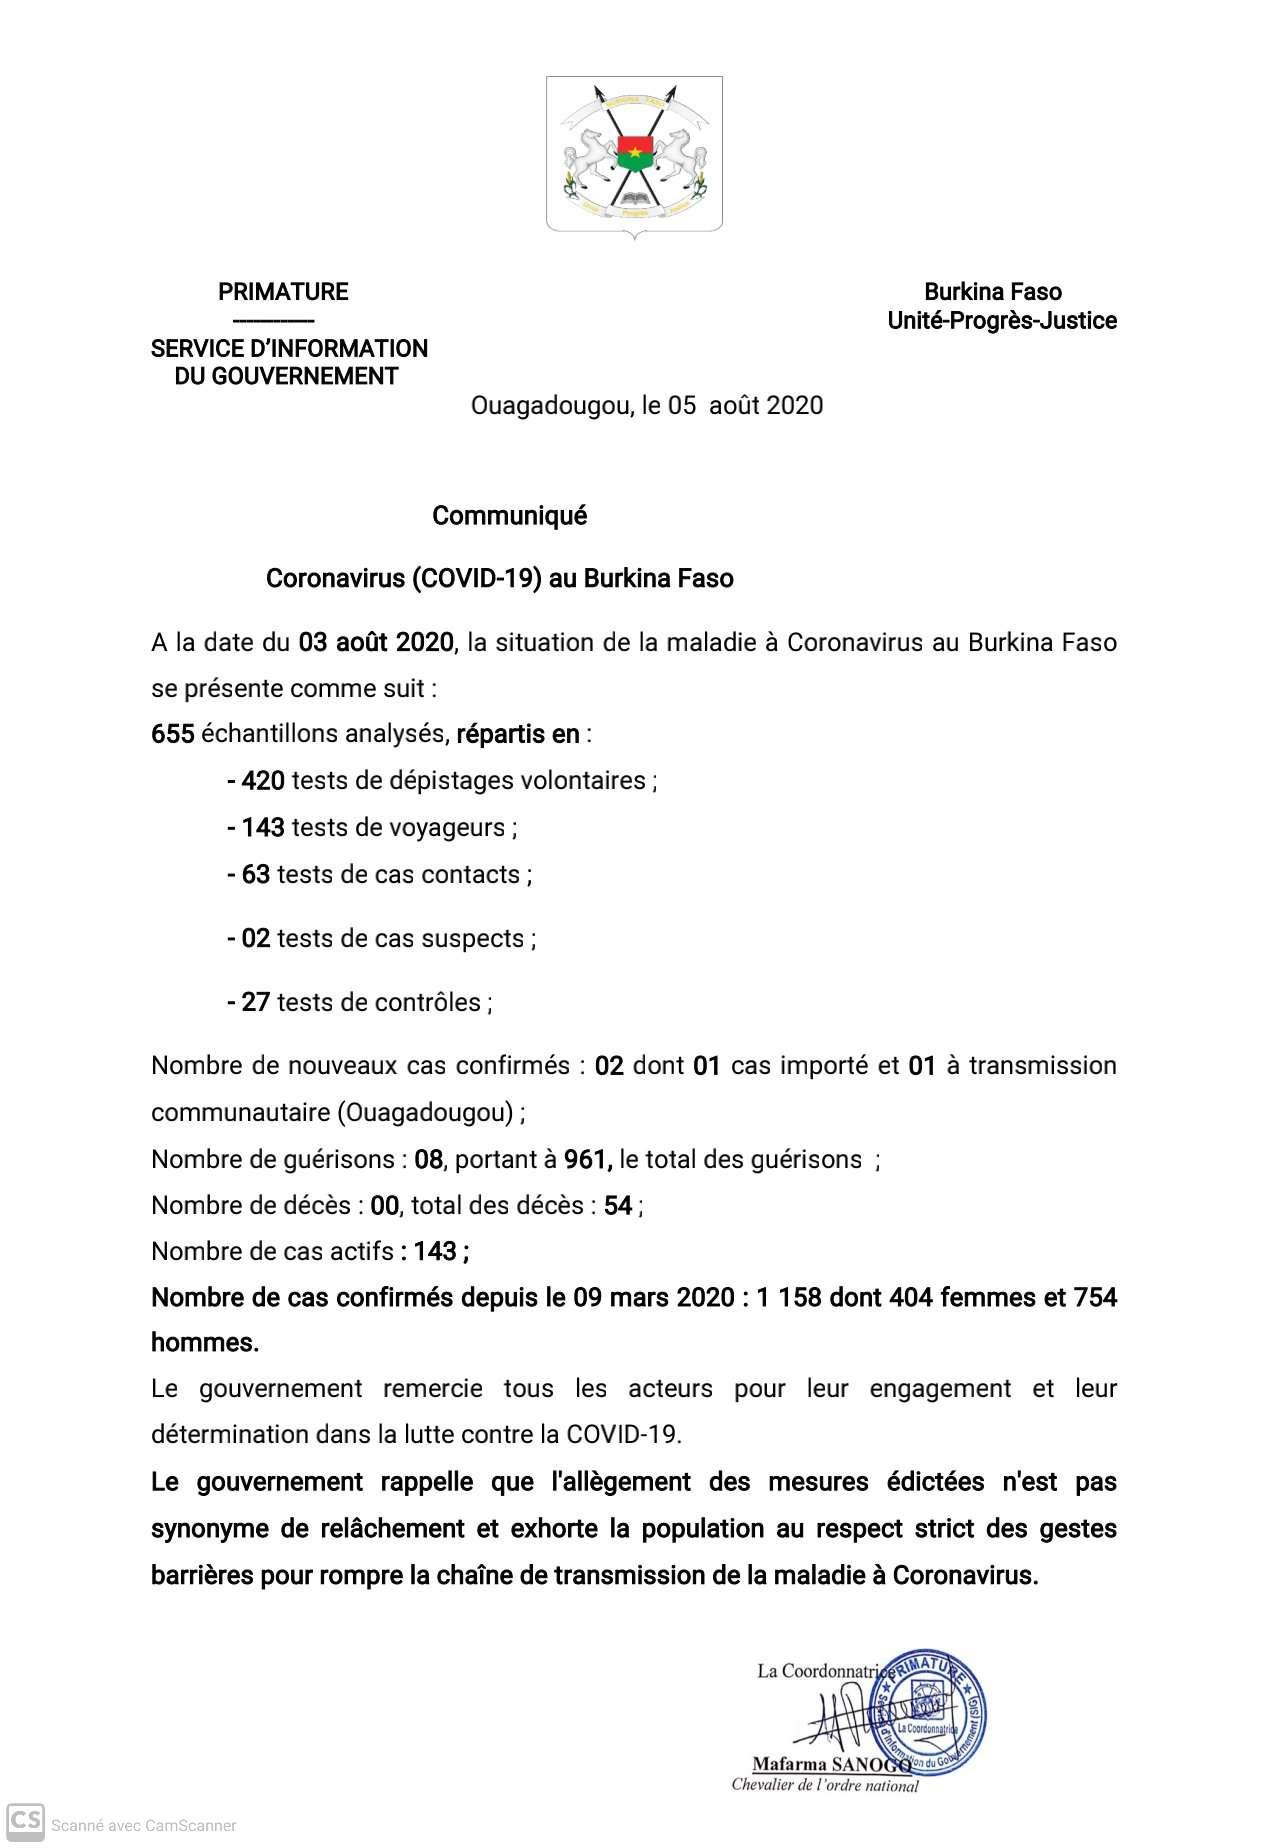 https://www.sig.gov.bf/fileadmin/user_upload/Communique___point__Covid-19_Burkina_Faso_03_aout_2020.jpg